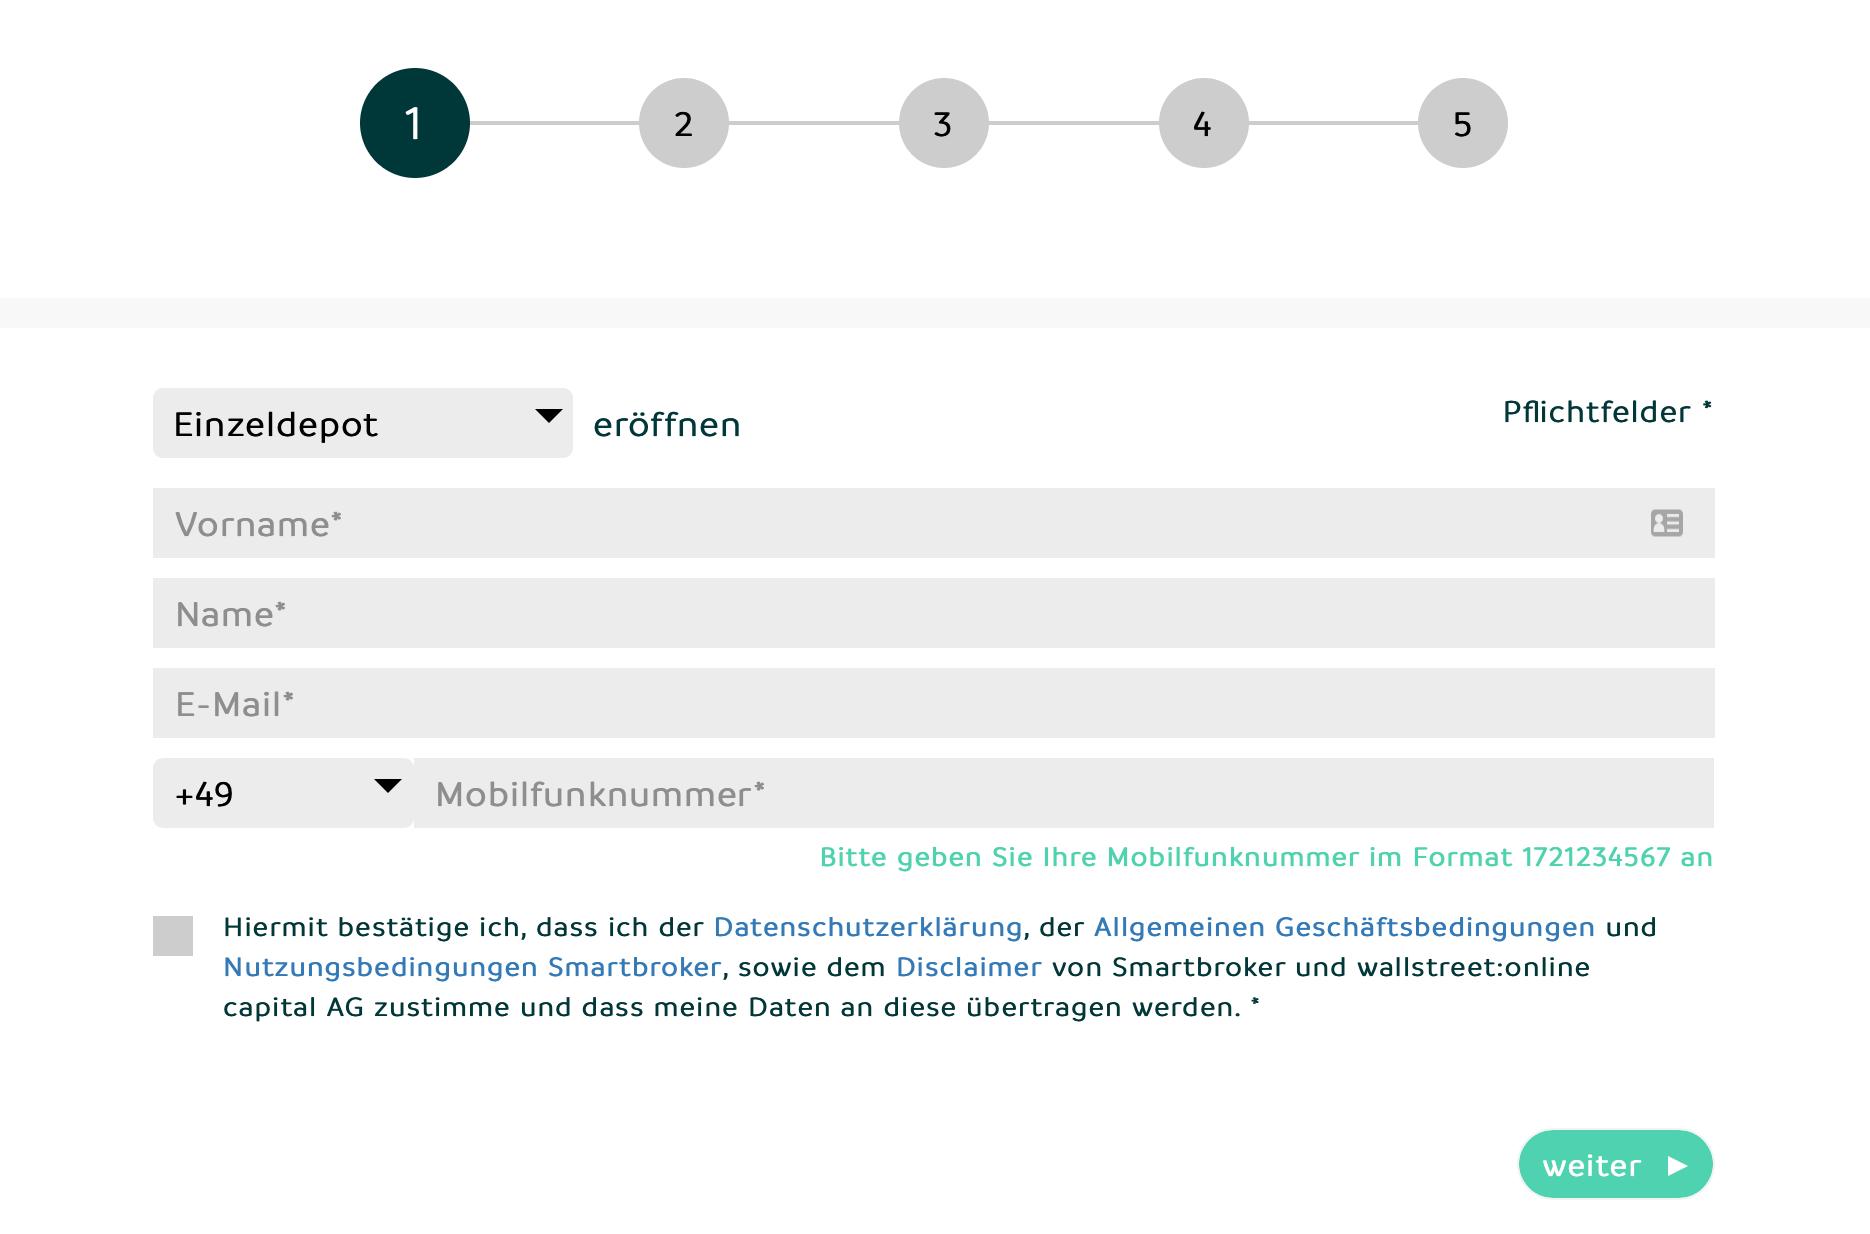 Smartbroker Name und Kontaktdaten